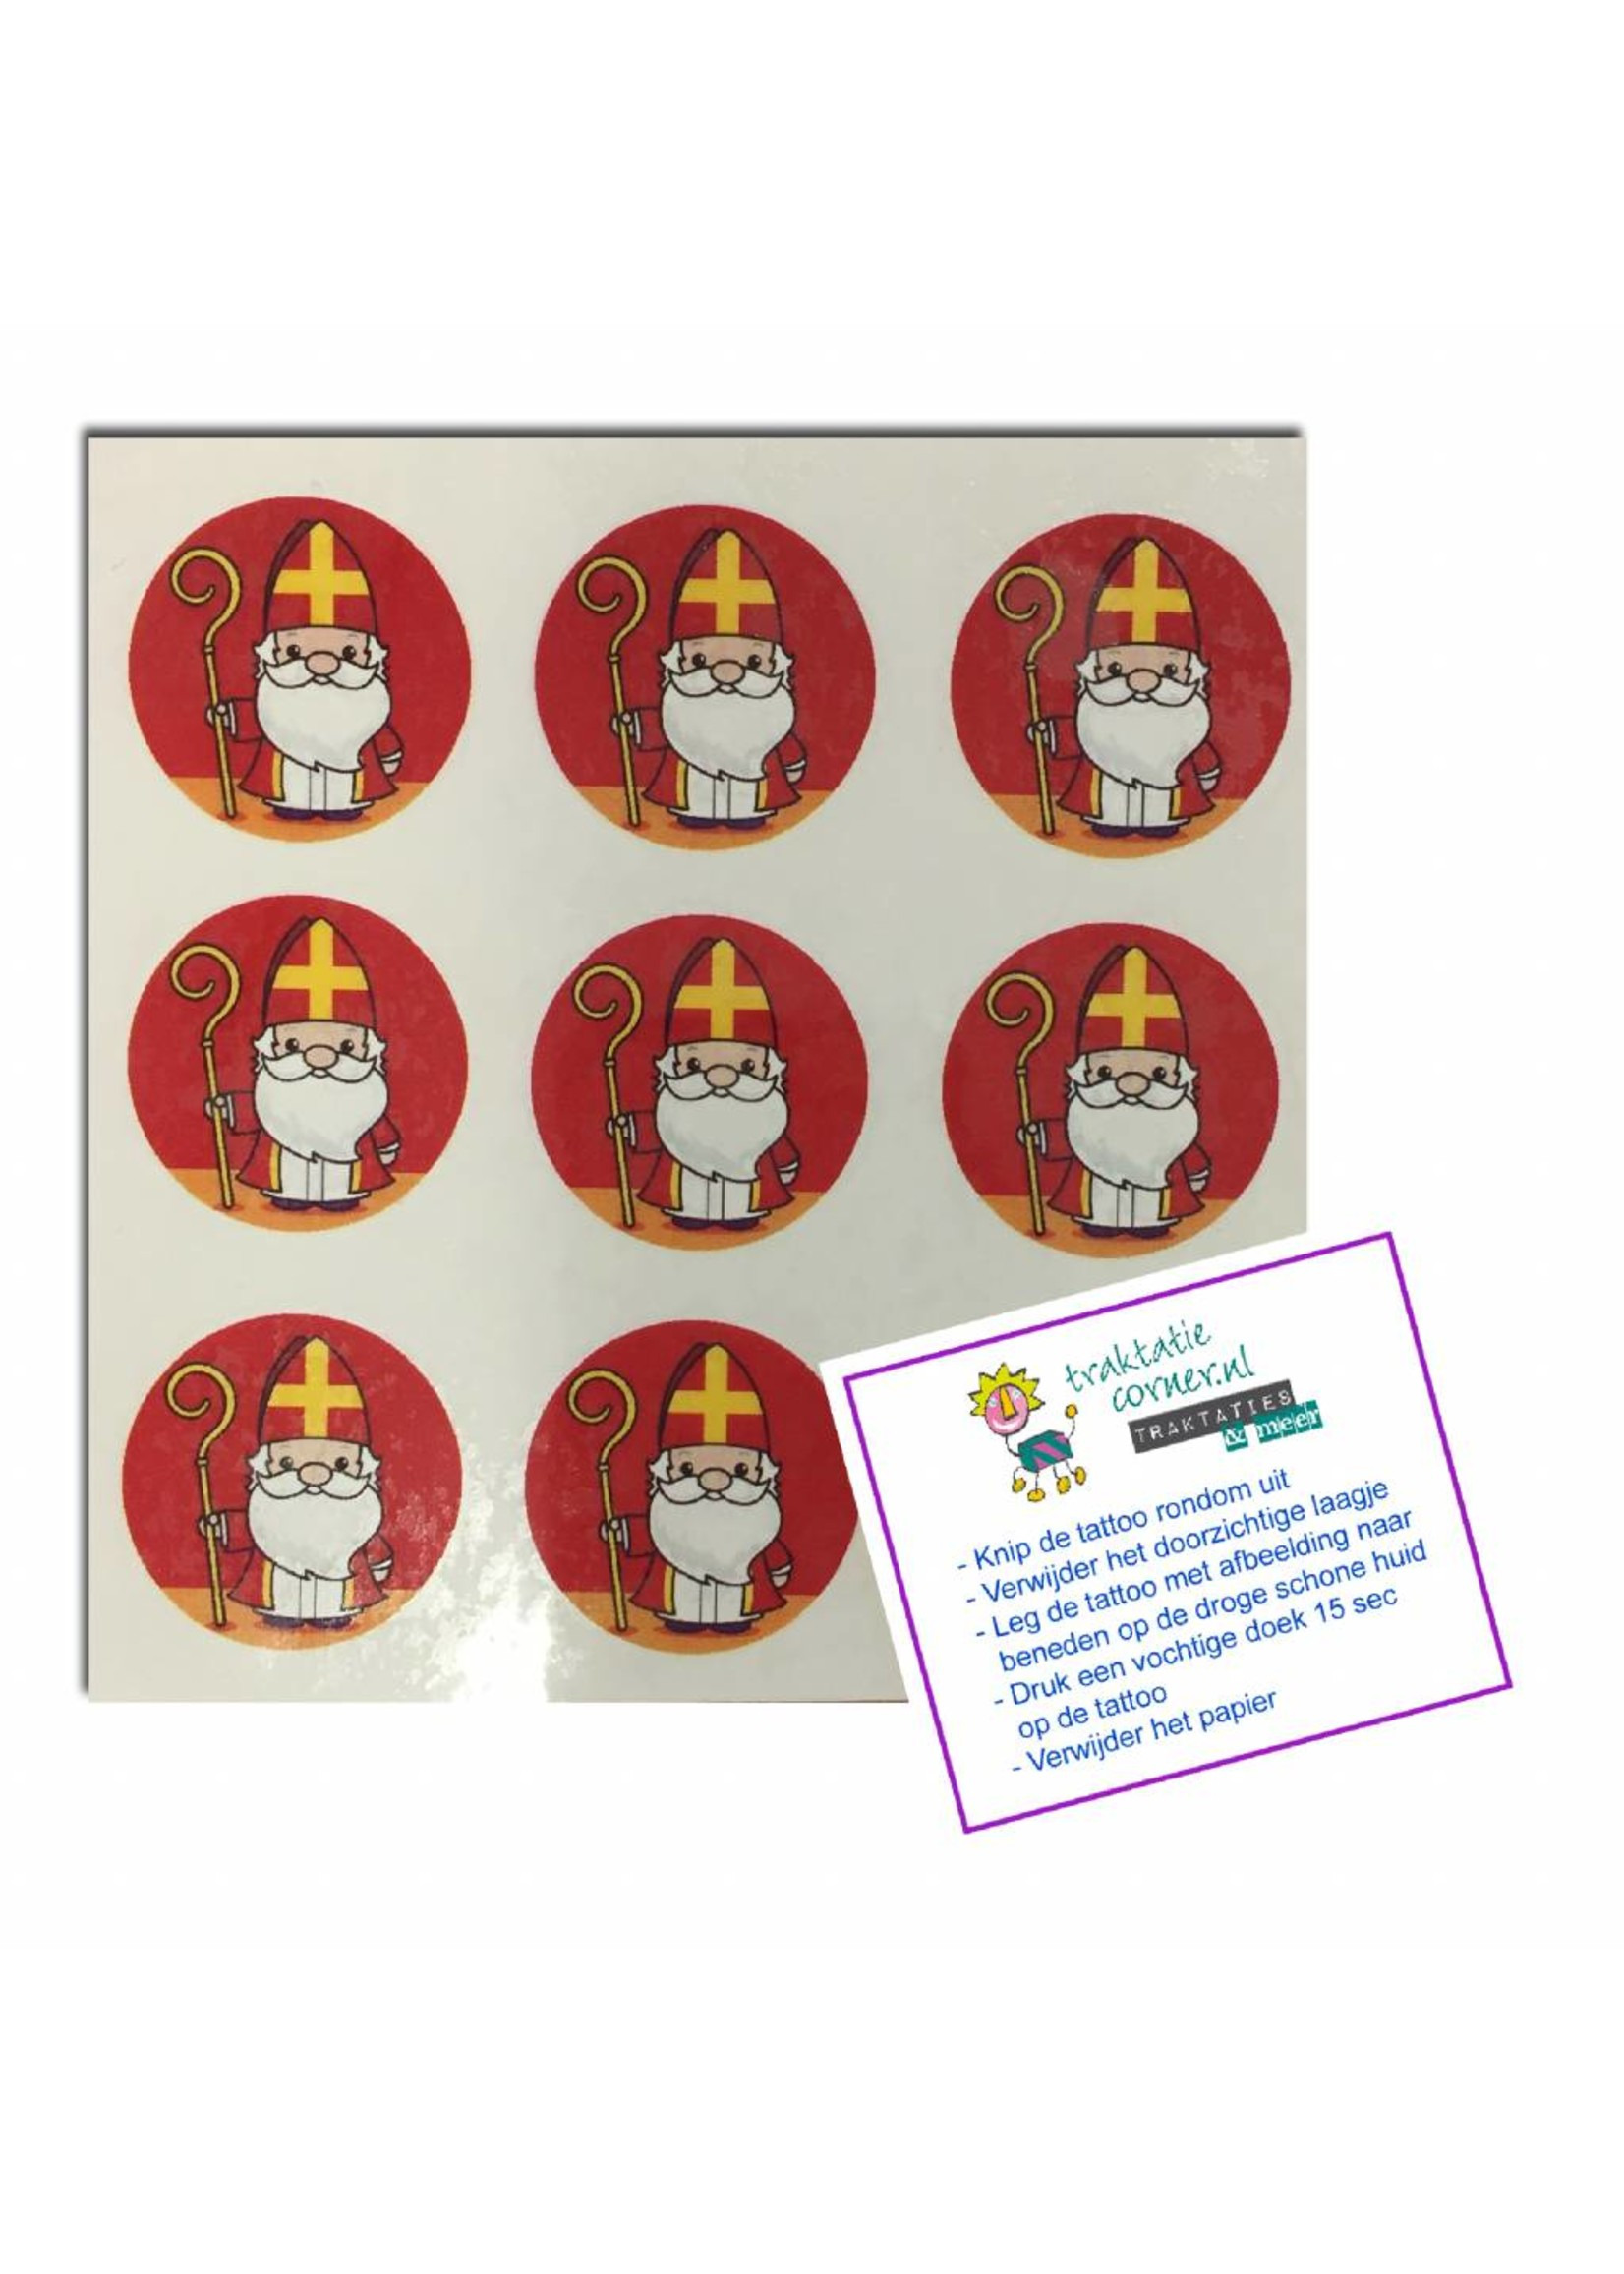 Sinterklaas tattoos - 9 stuks